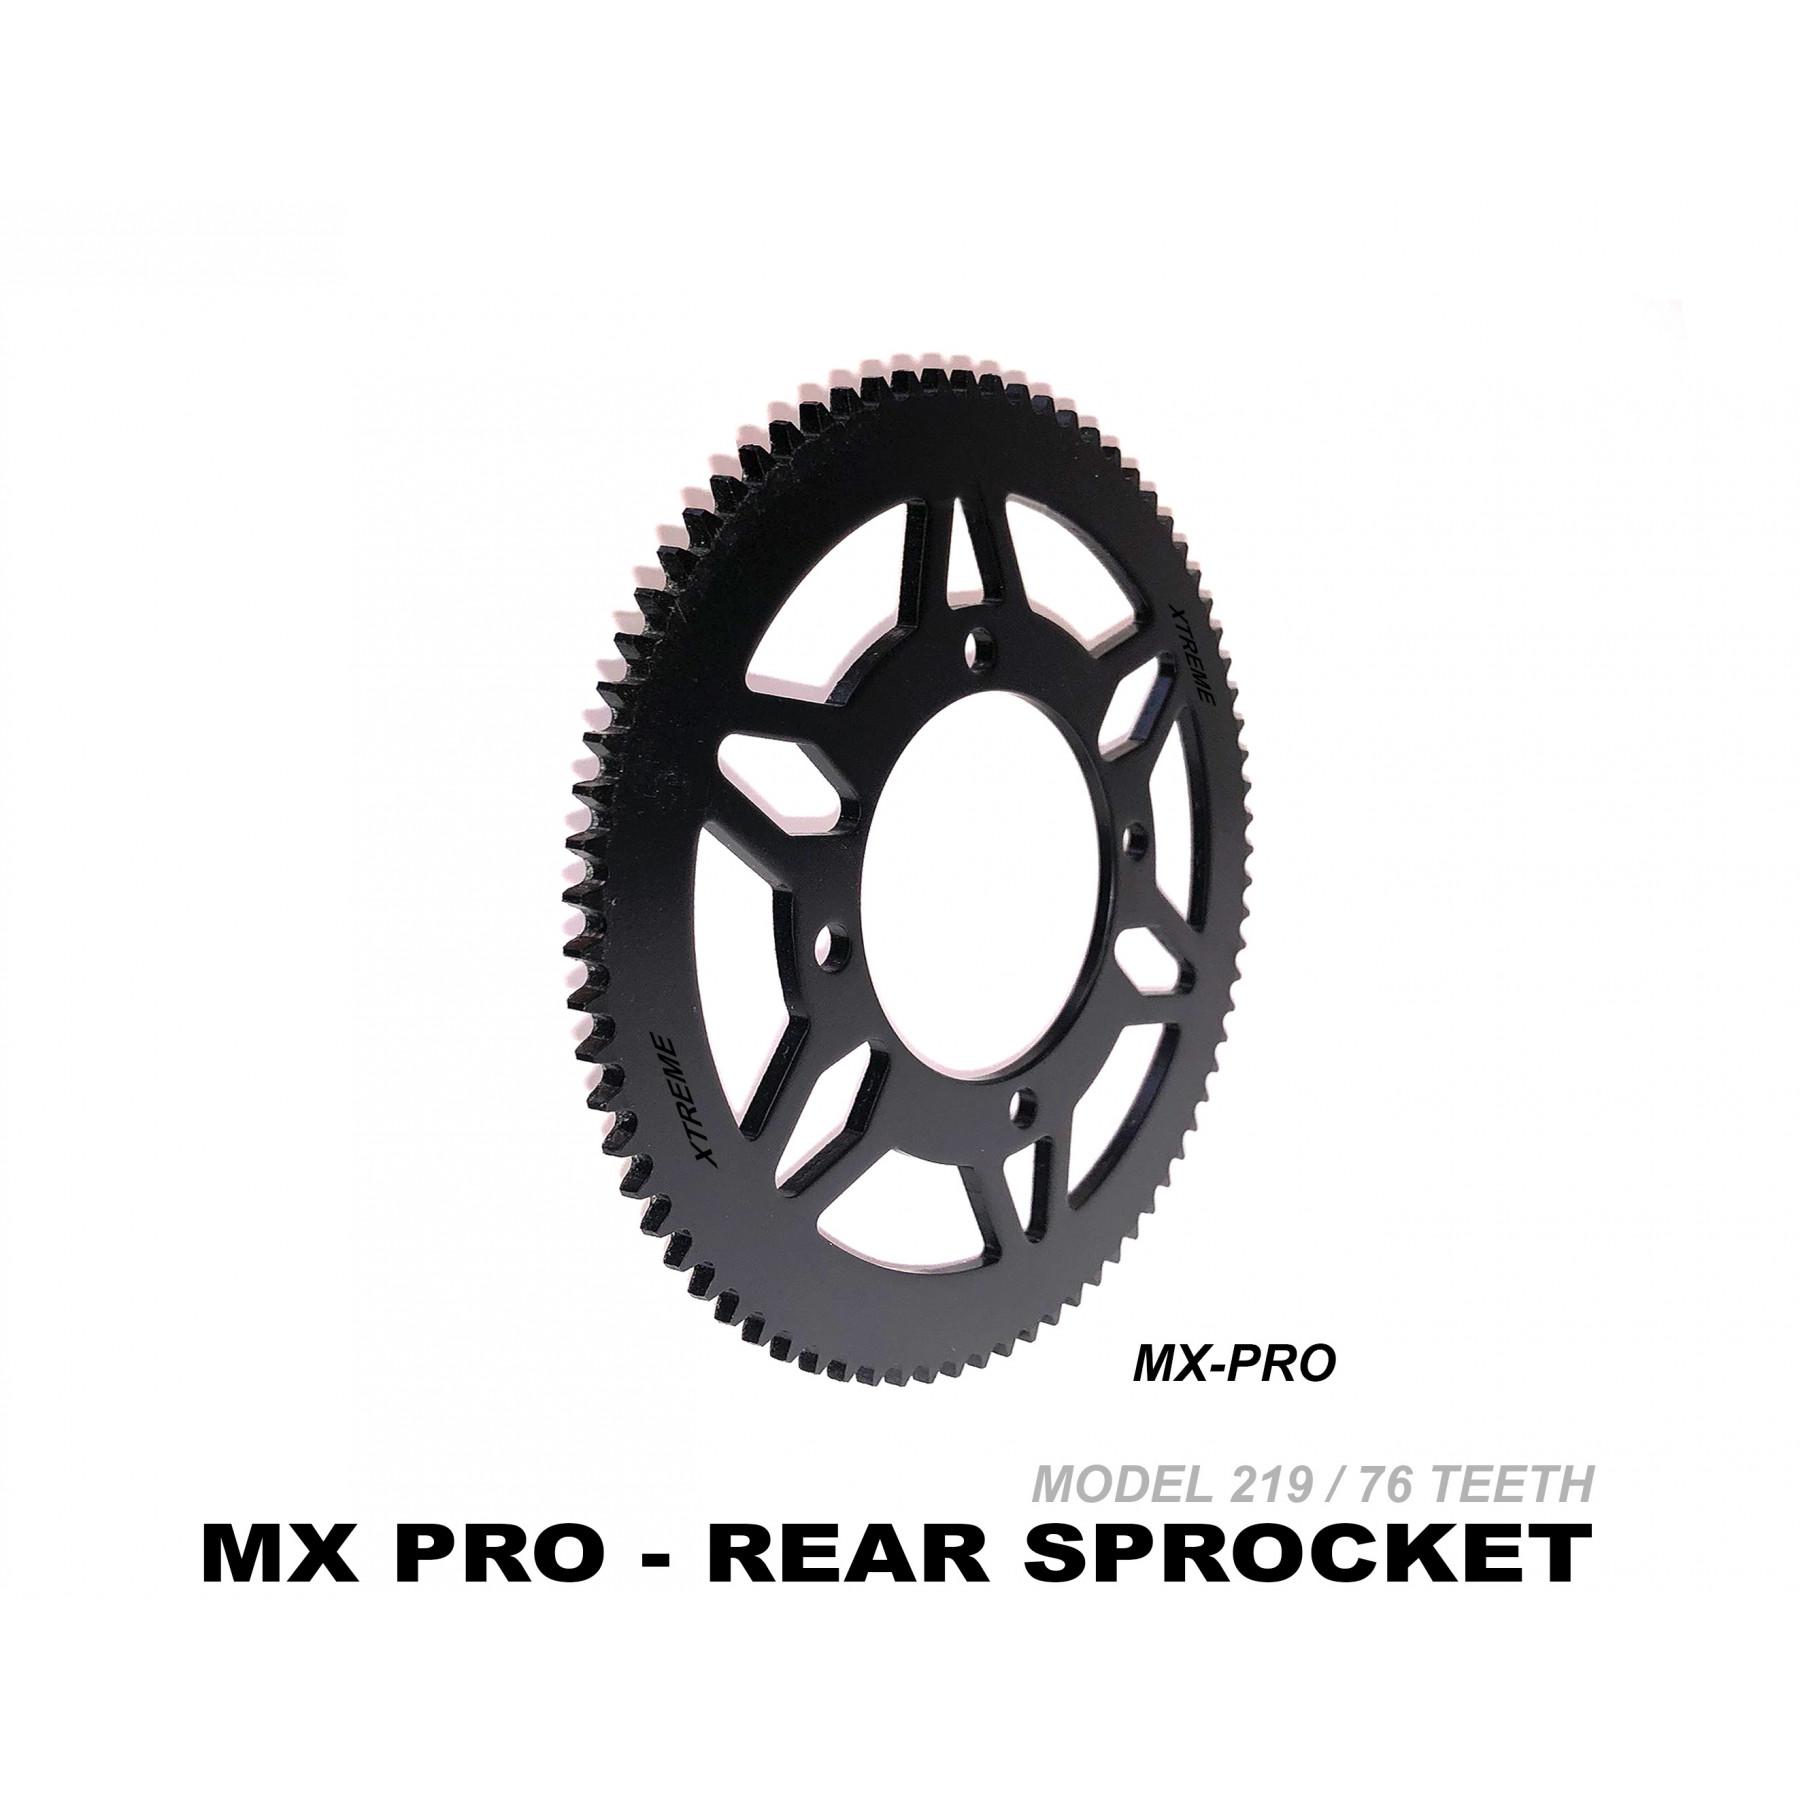 XTREME ELECTRIC XTM MX-PRO 36V REPLACEMENT REAR SPROCKET